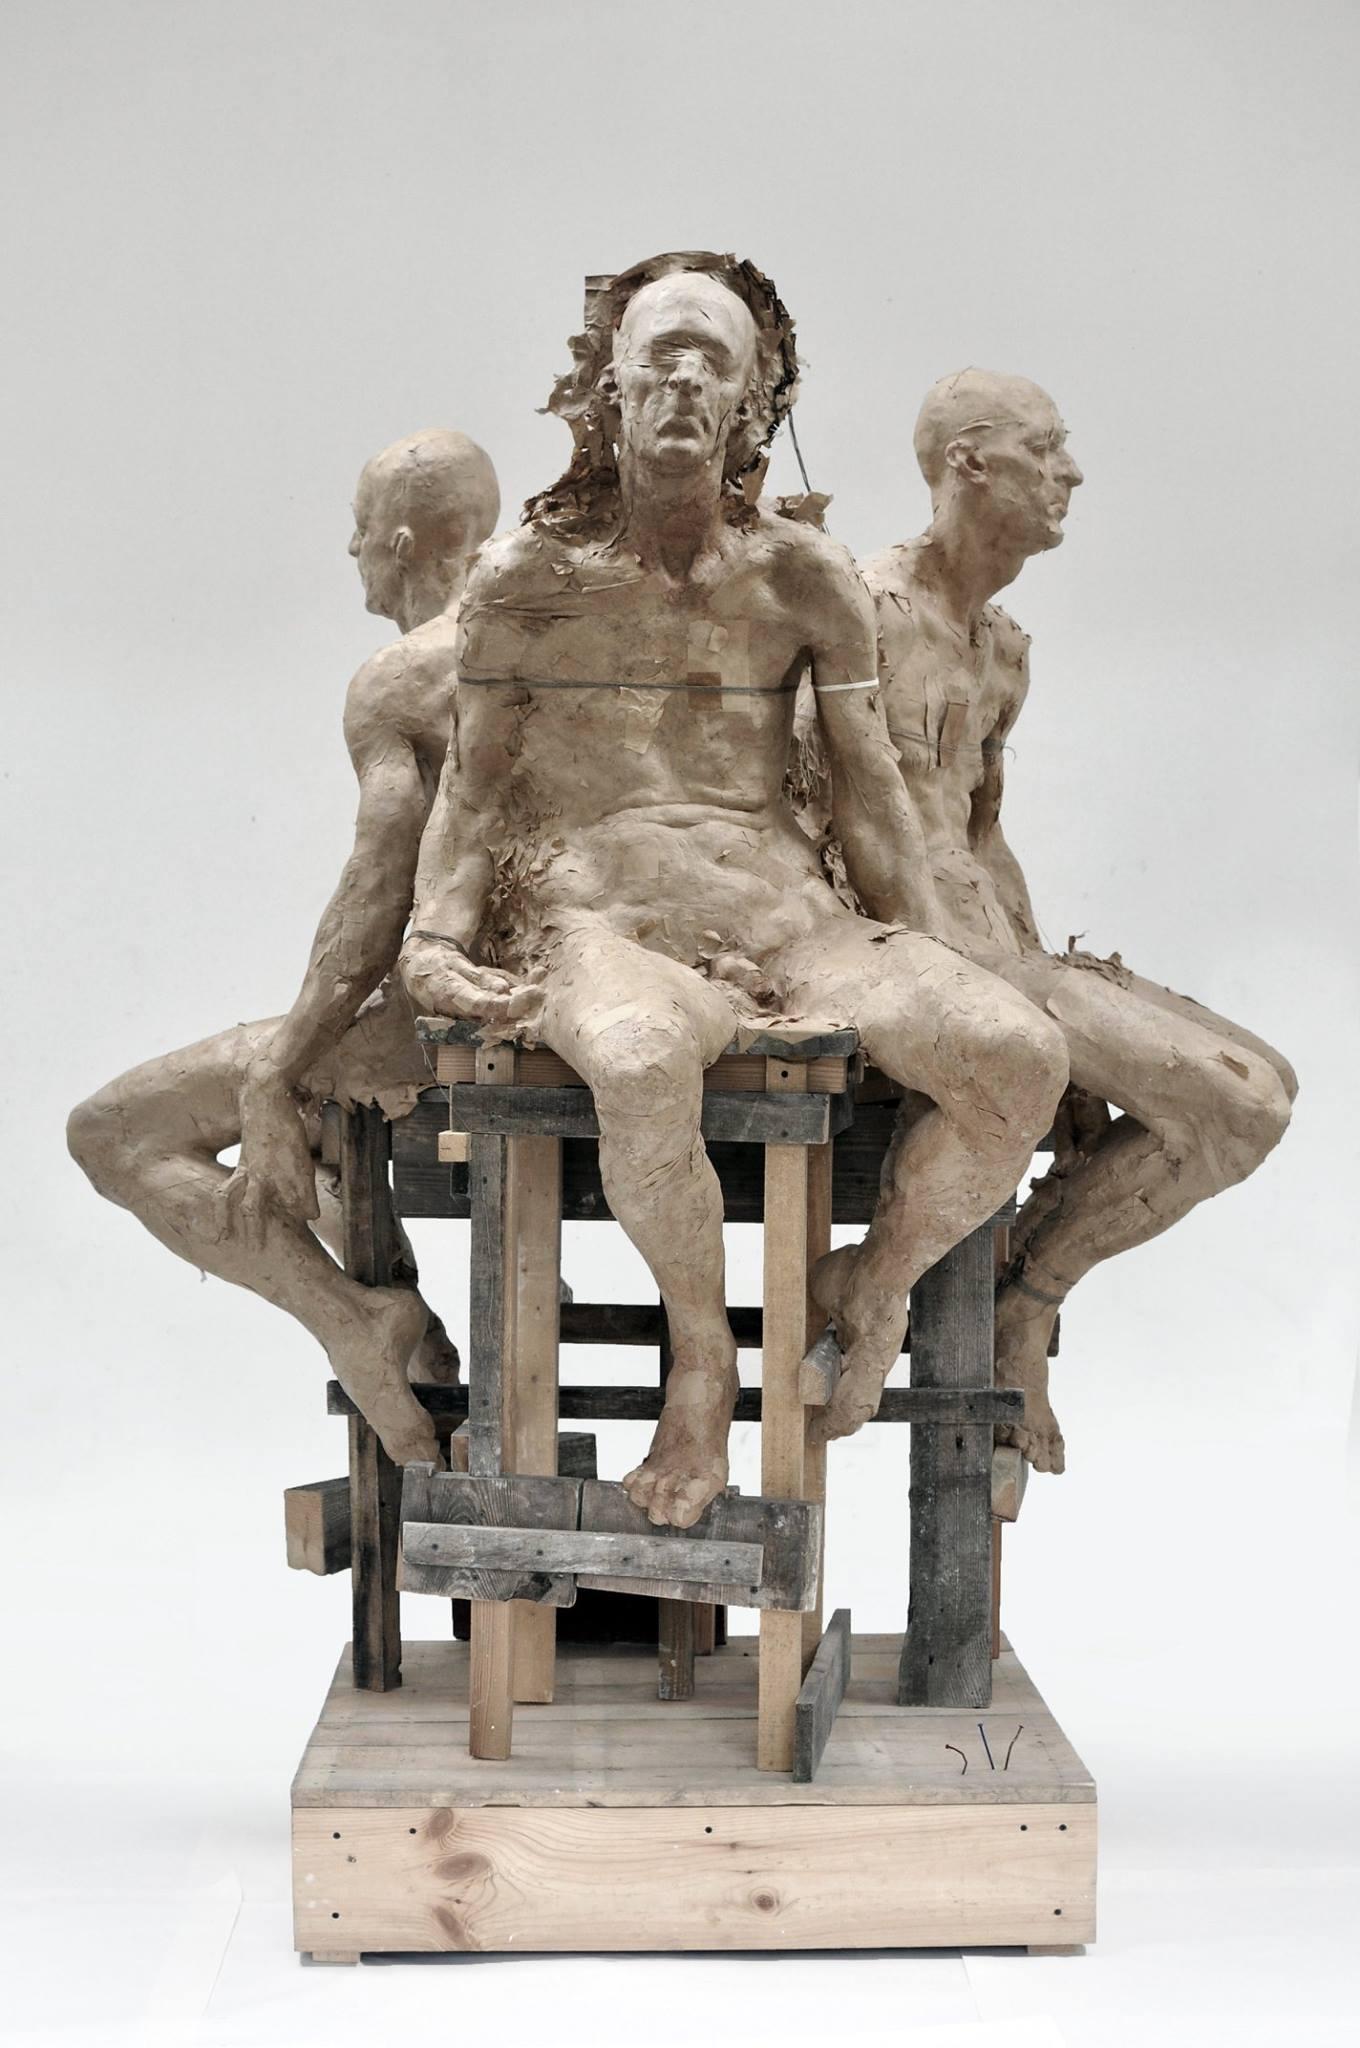 Grzegorz Gwiazda – Sculptures Heretic